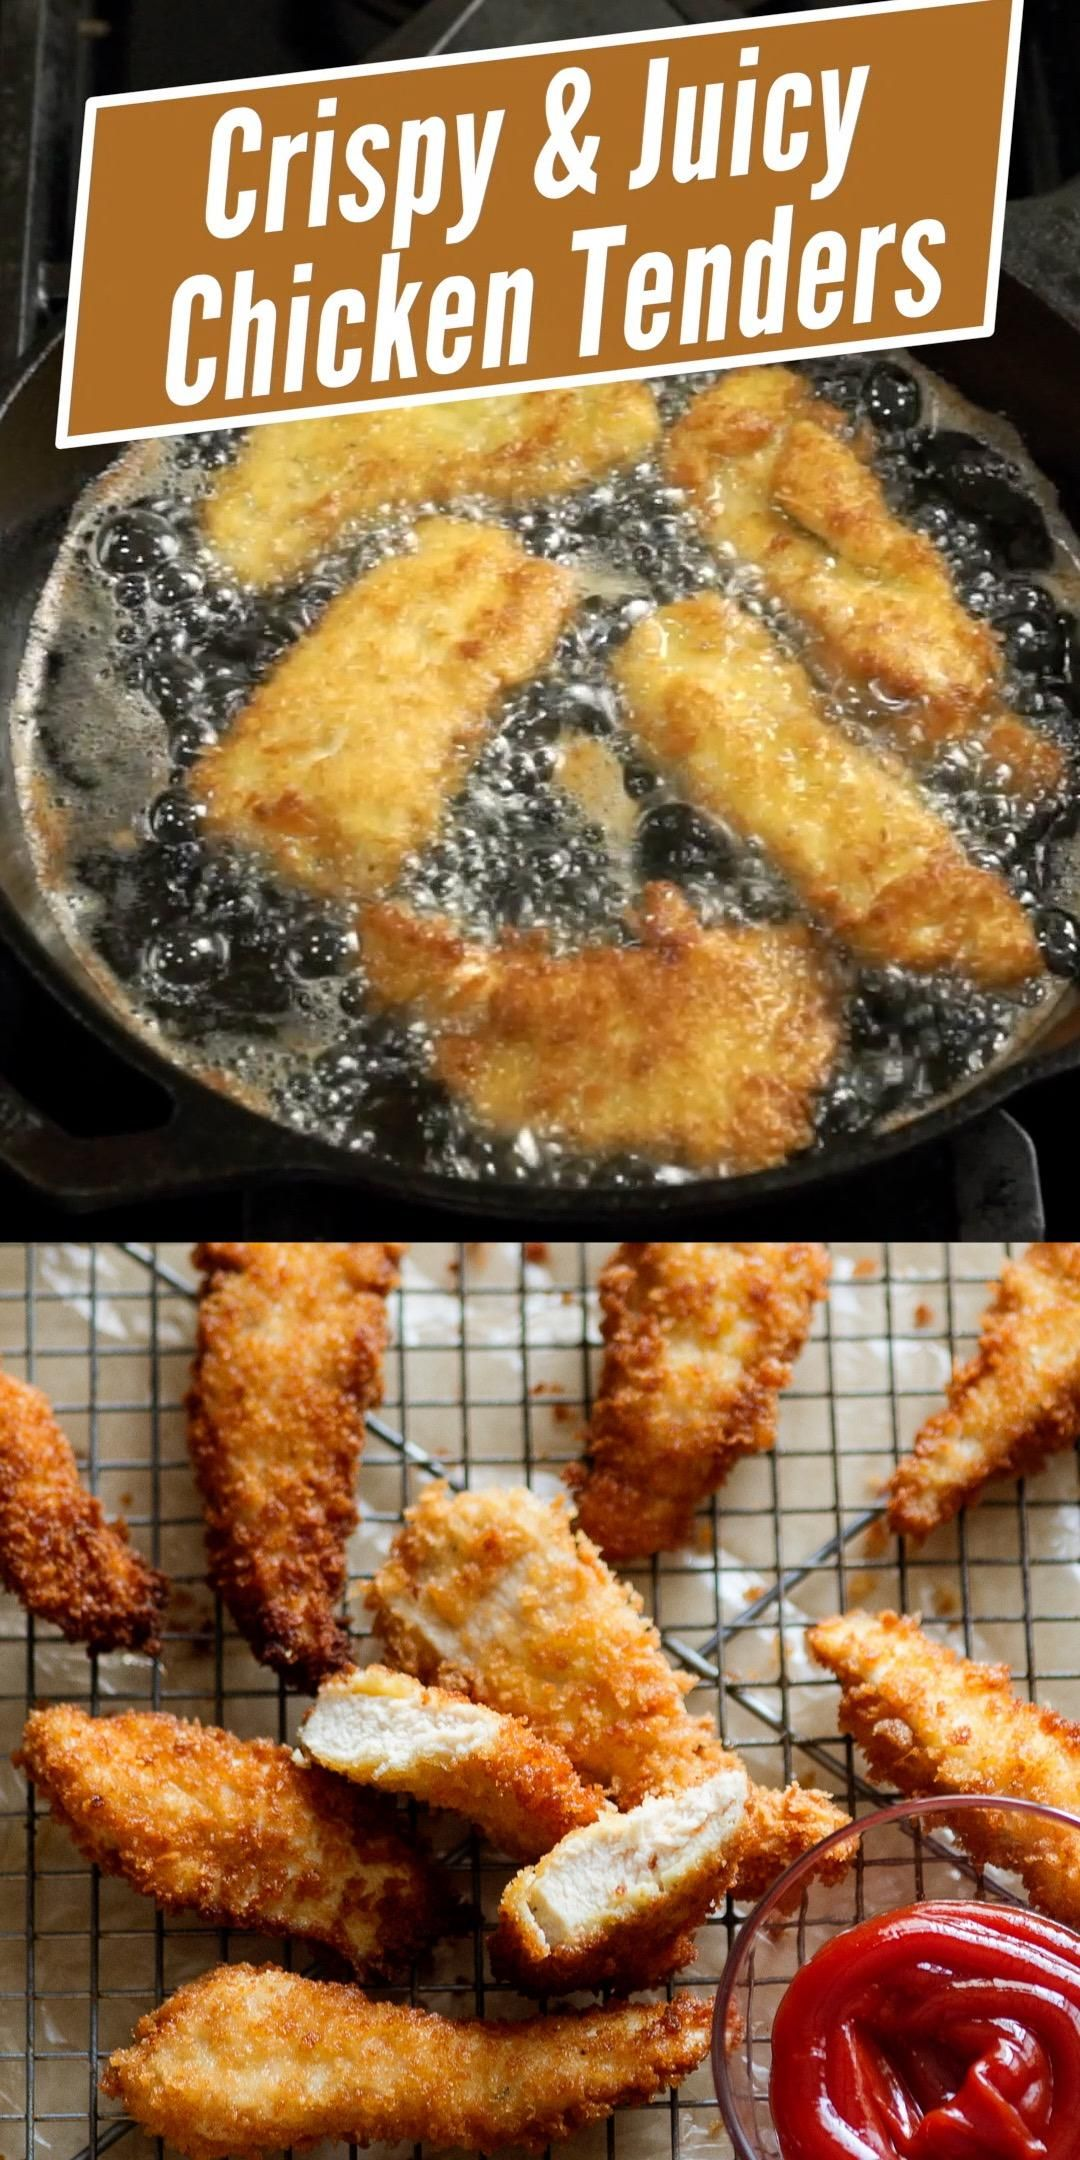 Fried Chicken Tenders Chicken Strips Recipe Best Recipe Box Video Recipe Video In 2020 Chicken Tenderloin Recipes Homemade Chicken Tenders Recipe Homemade Chicken Tenders